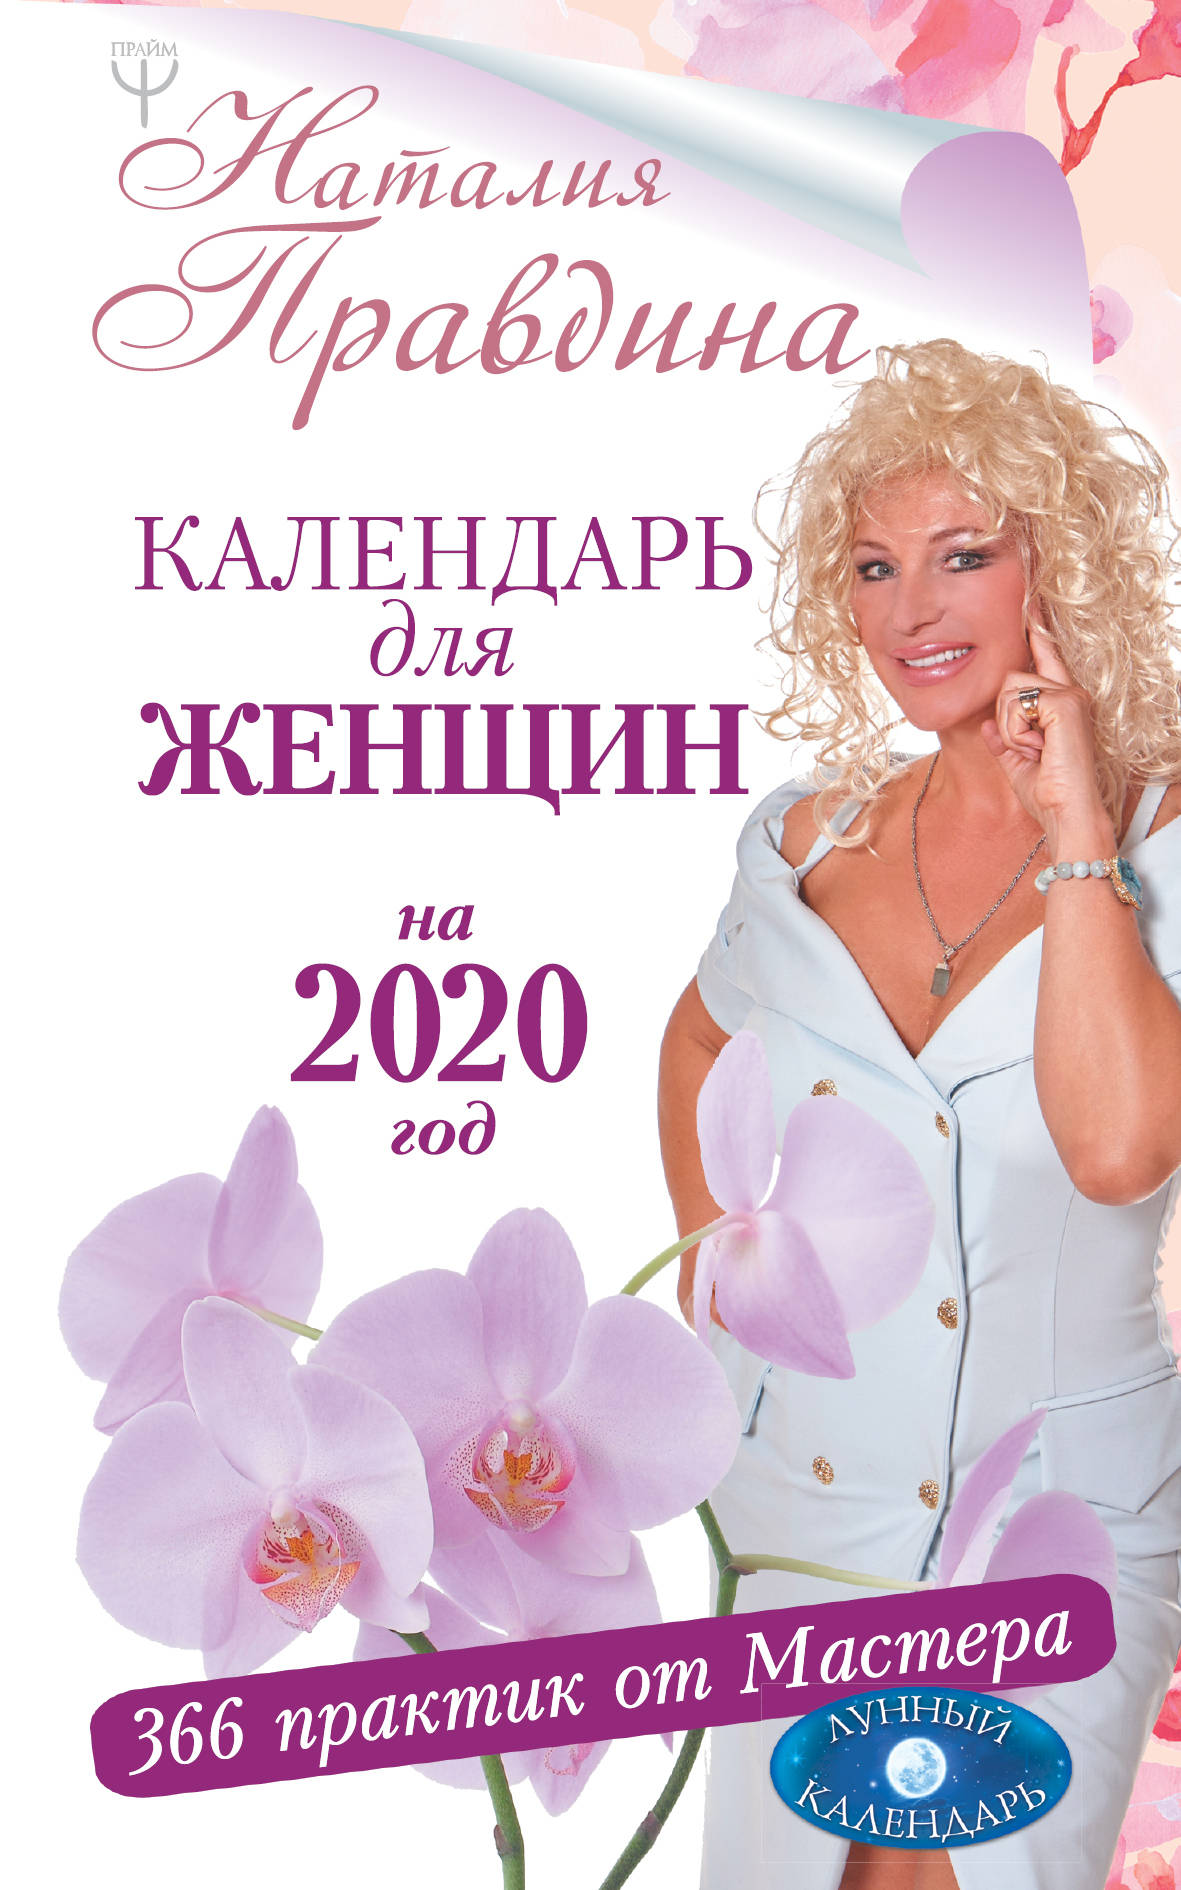 Kalendar dlja zhenschin na 2020 god. 366 praktik ot Mastera. Lunnyj kalendar